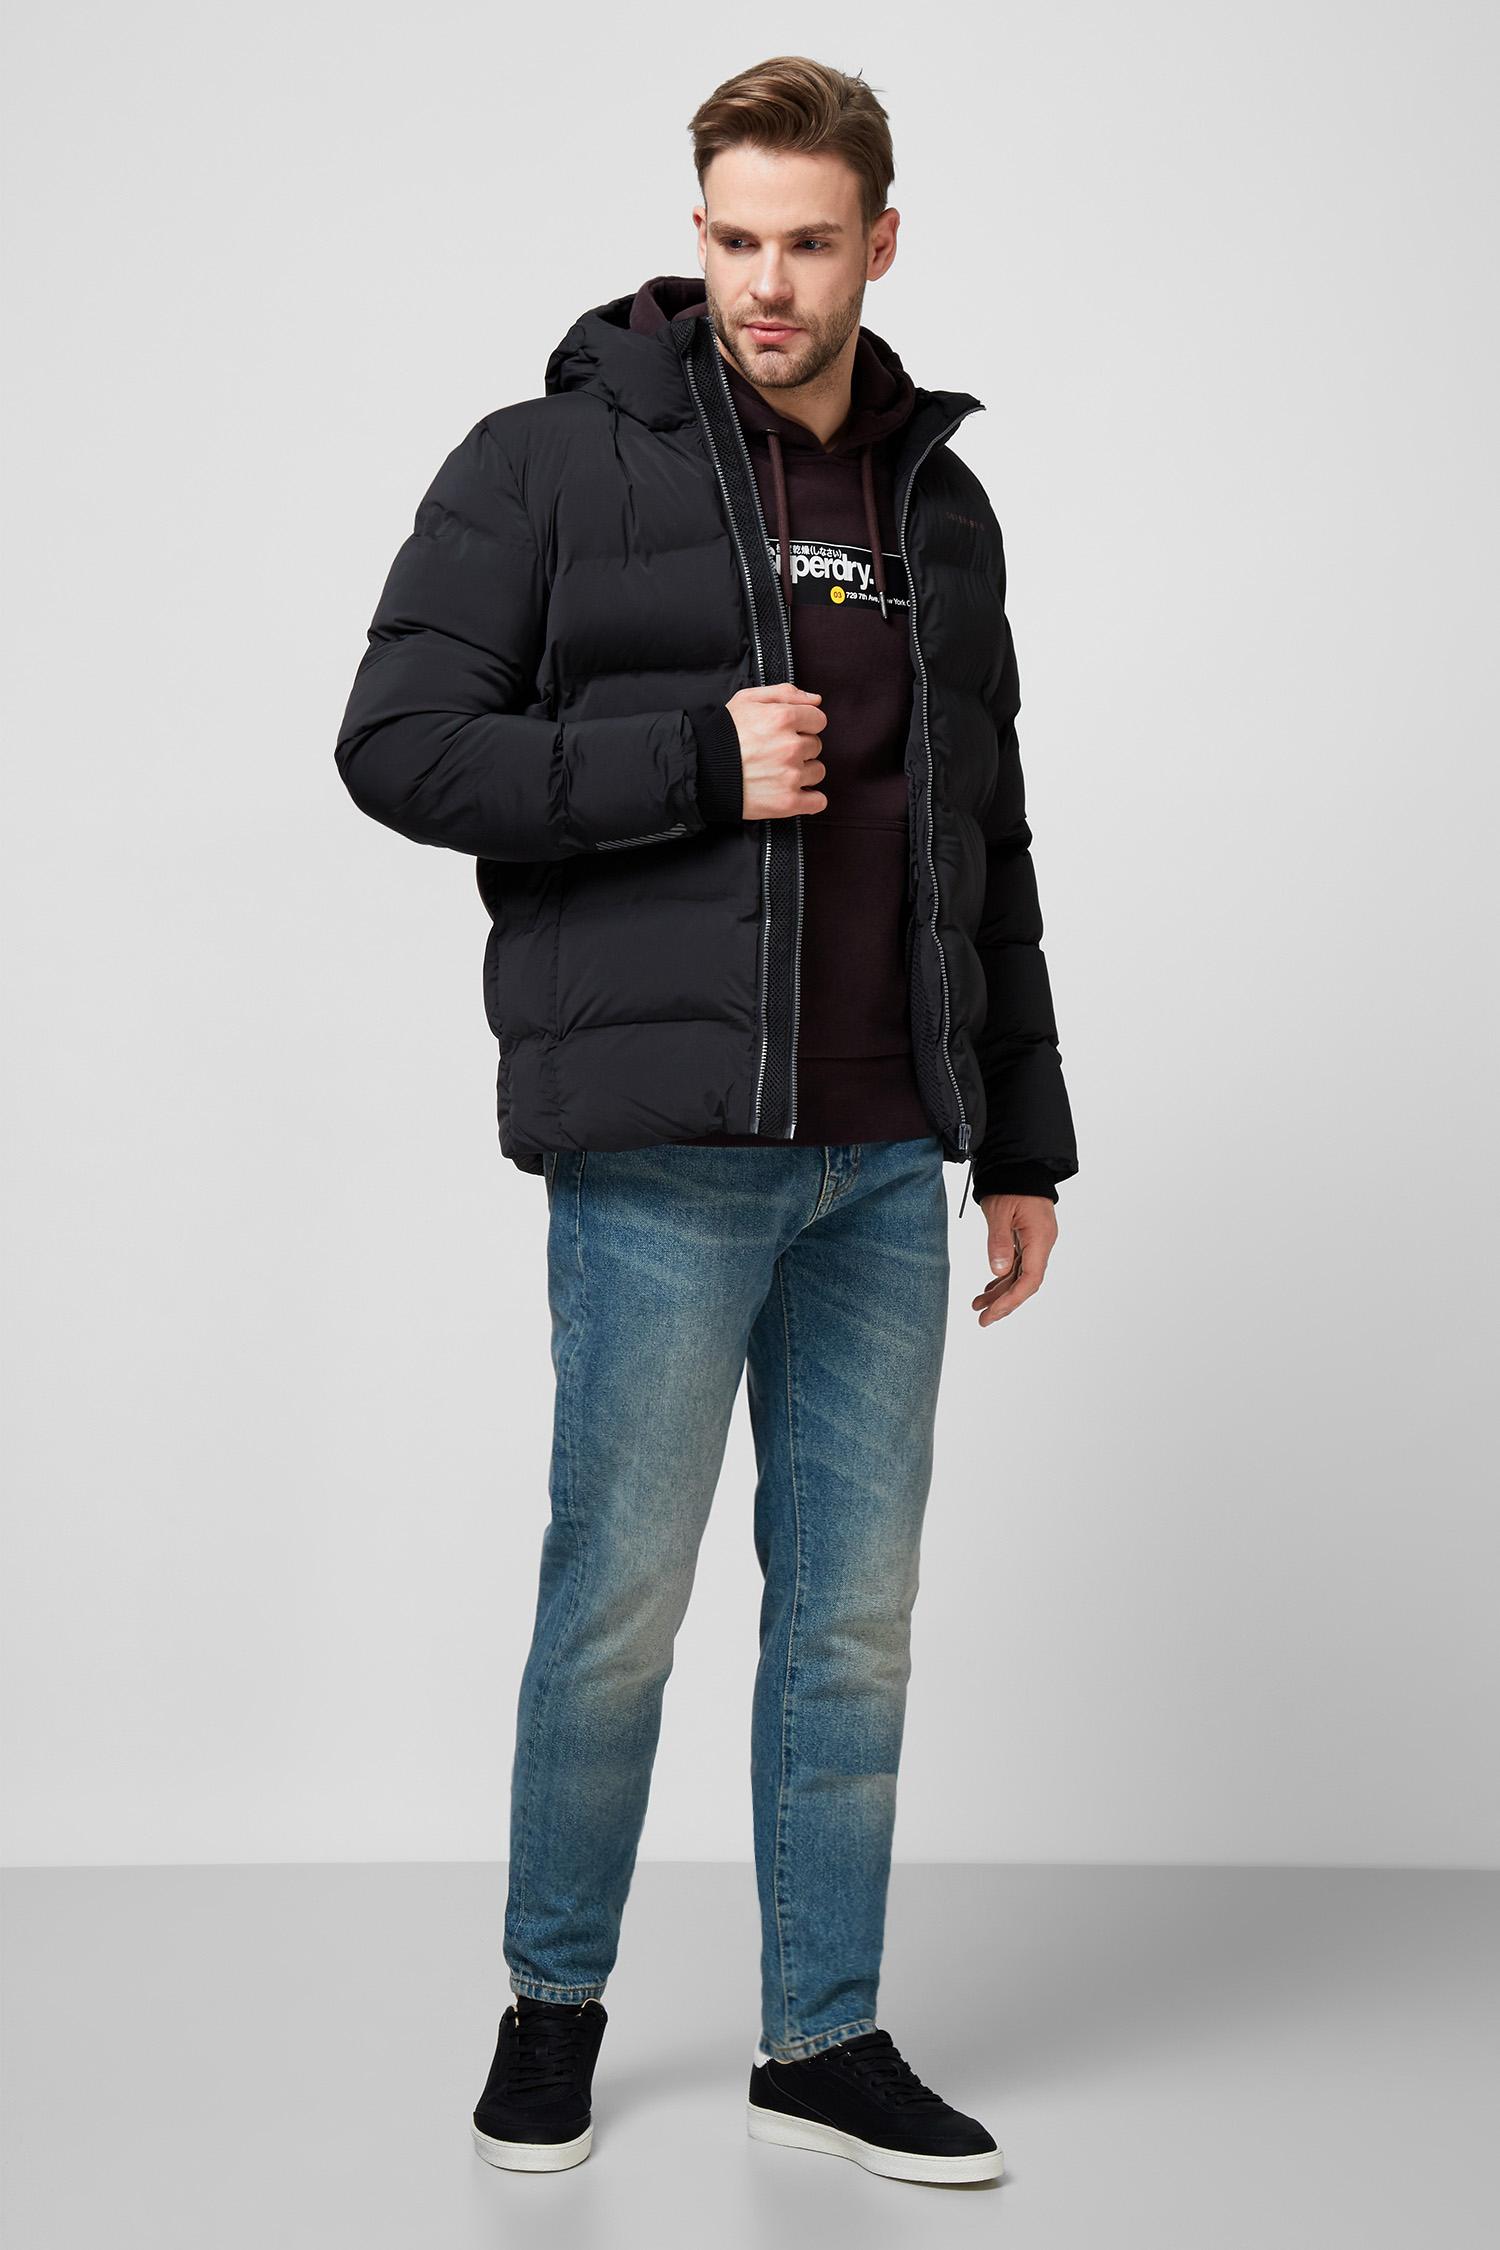 Мужская черная куртка SuperDry MS310285A;02A